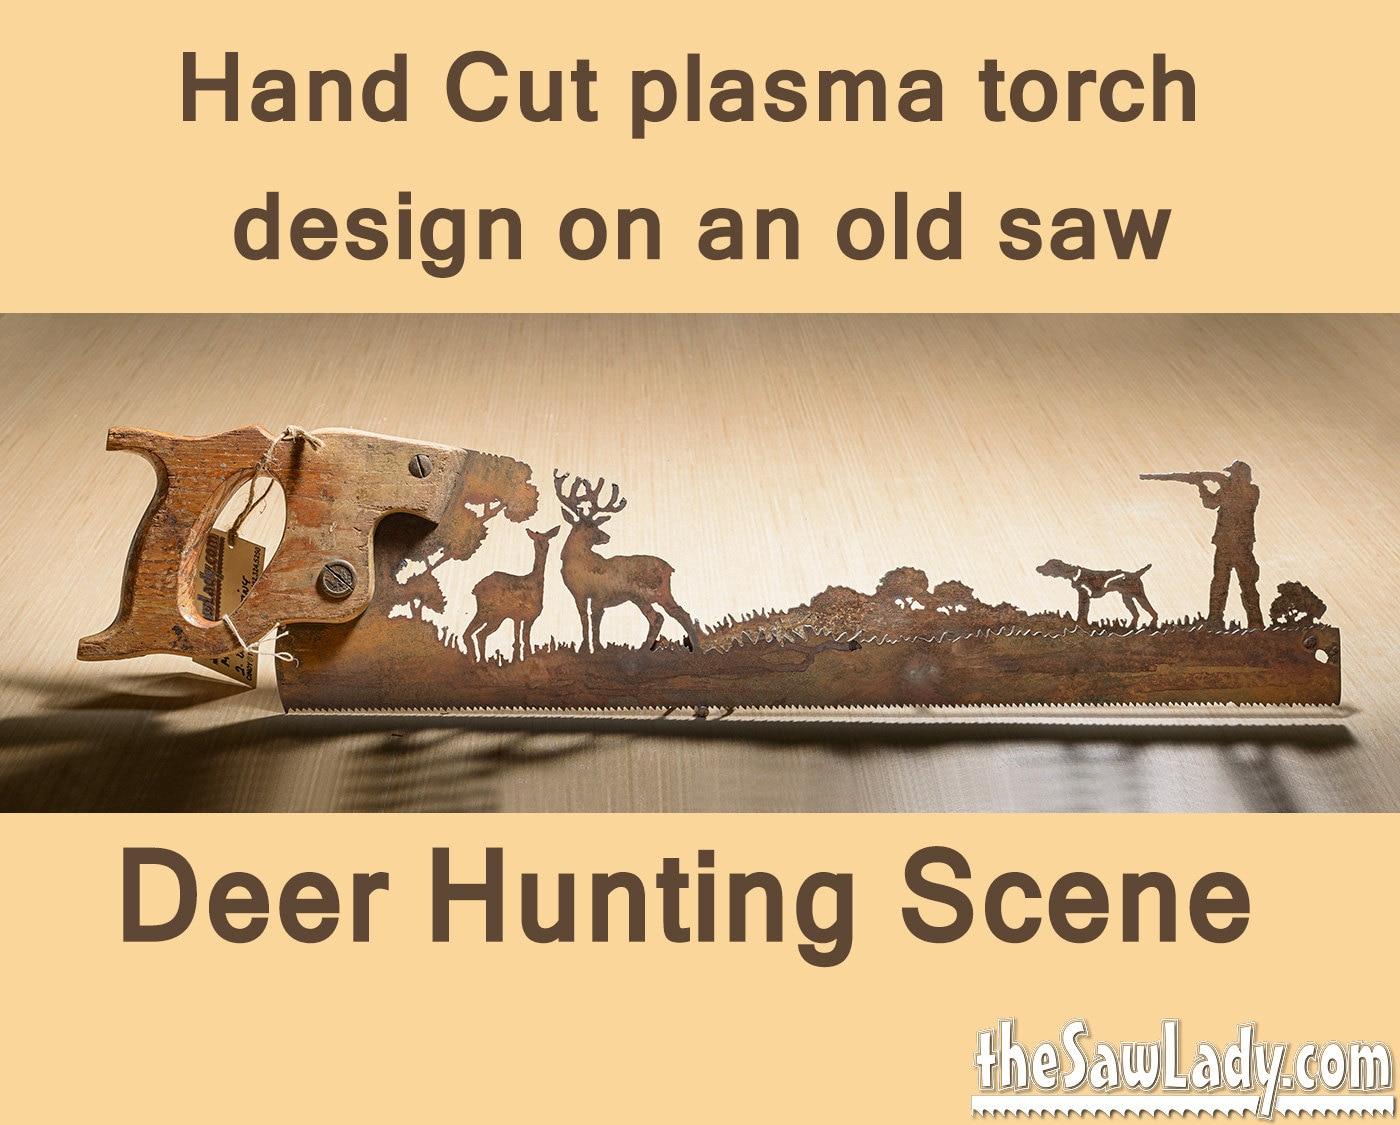 Metal Art Deer Hunter design Hand cut plasma hand saw Wall